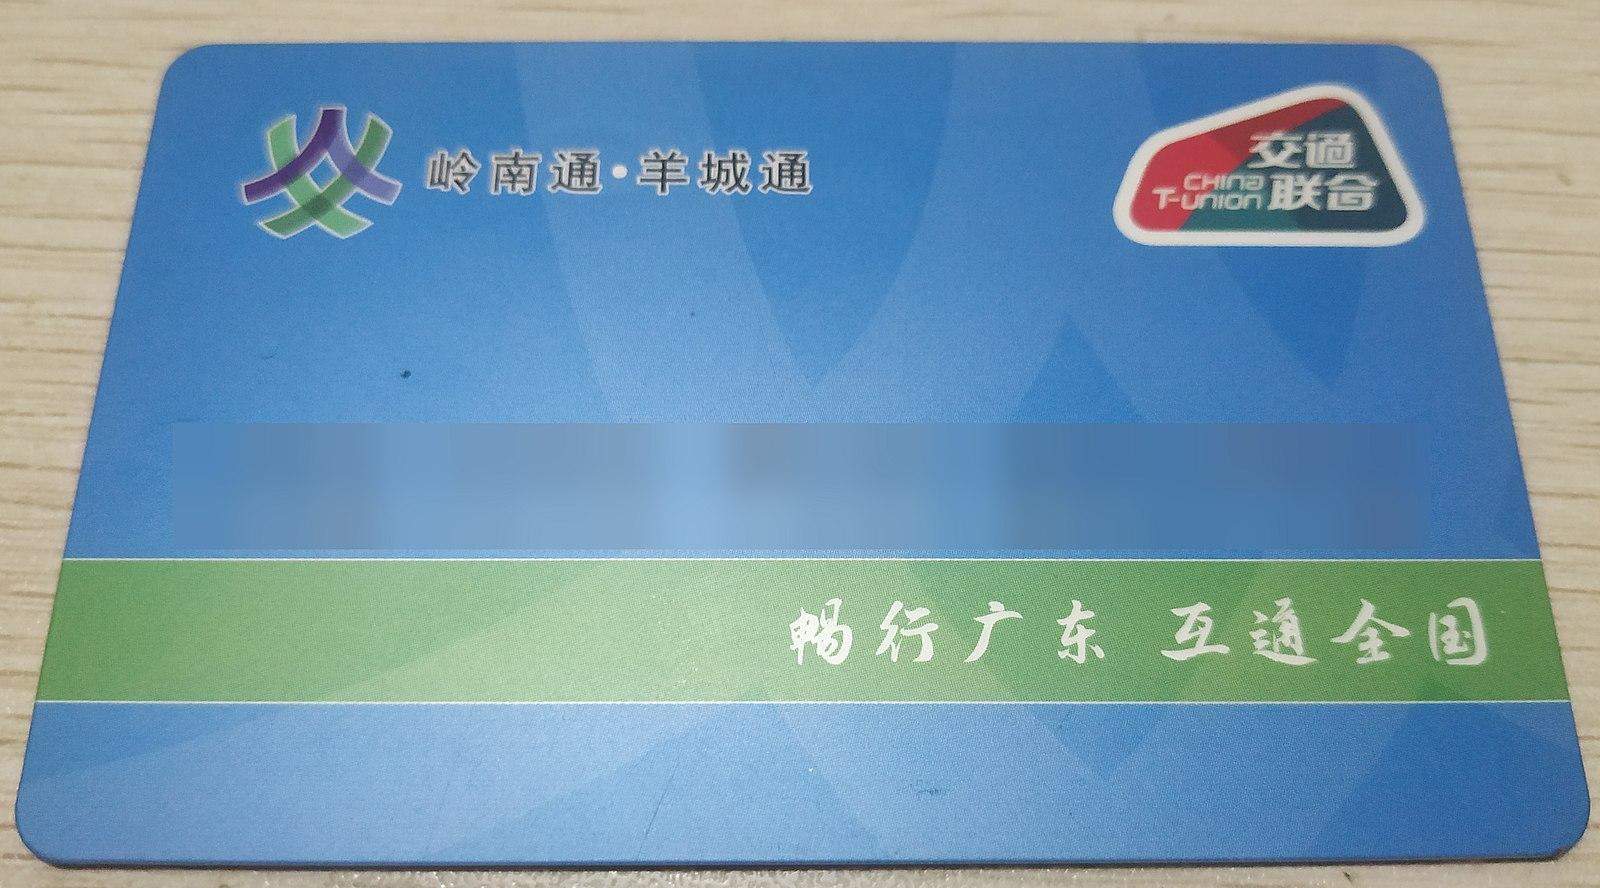 Tarjeta de transporte de T-Union